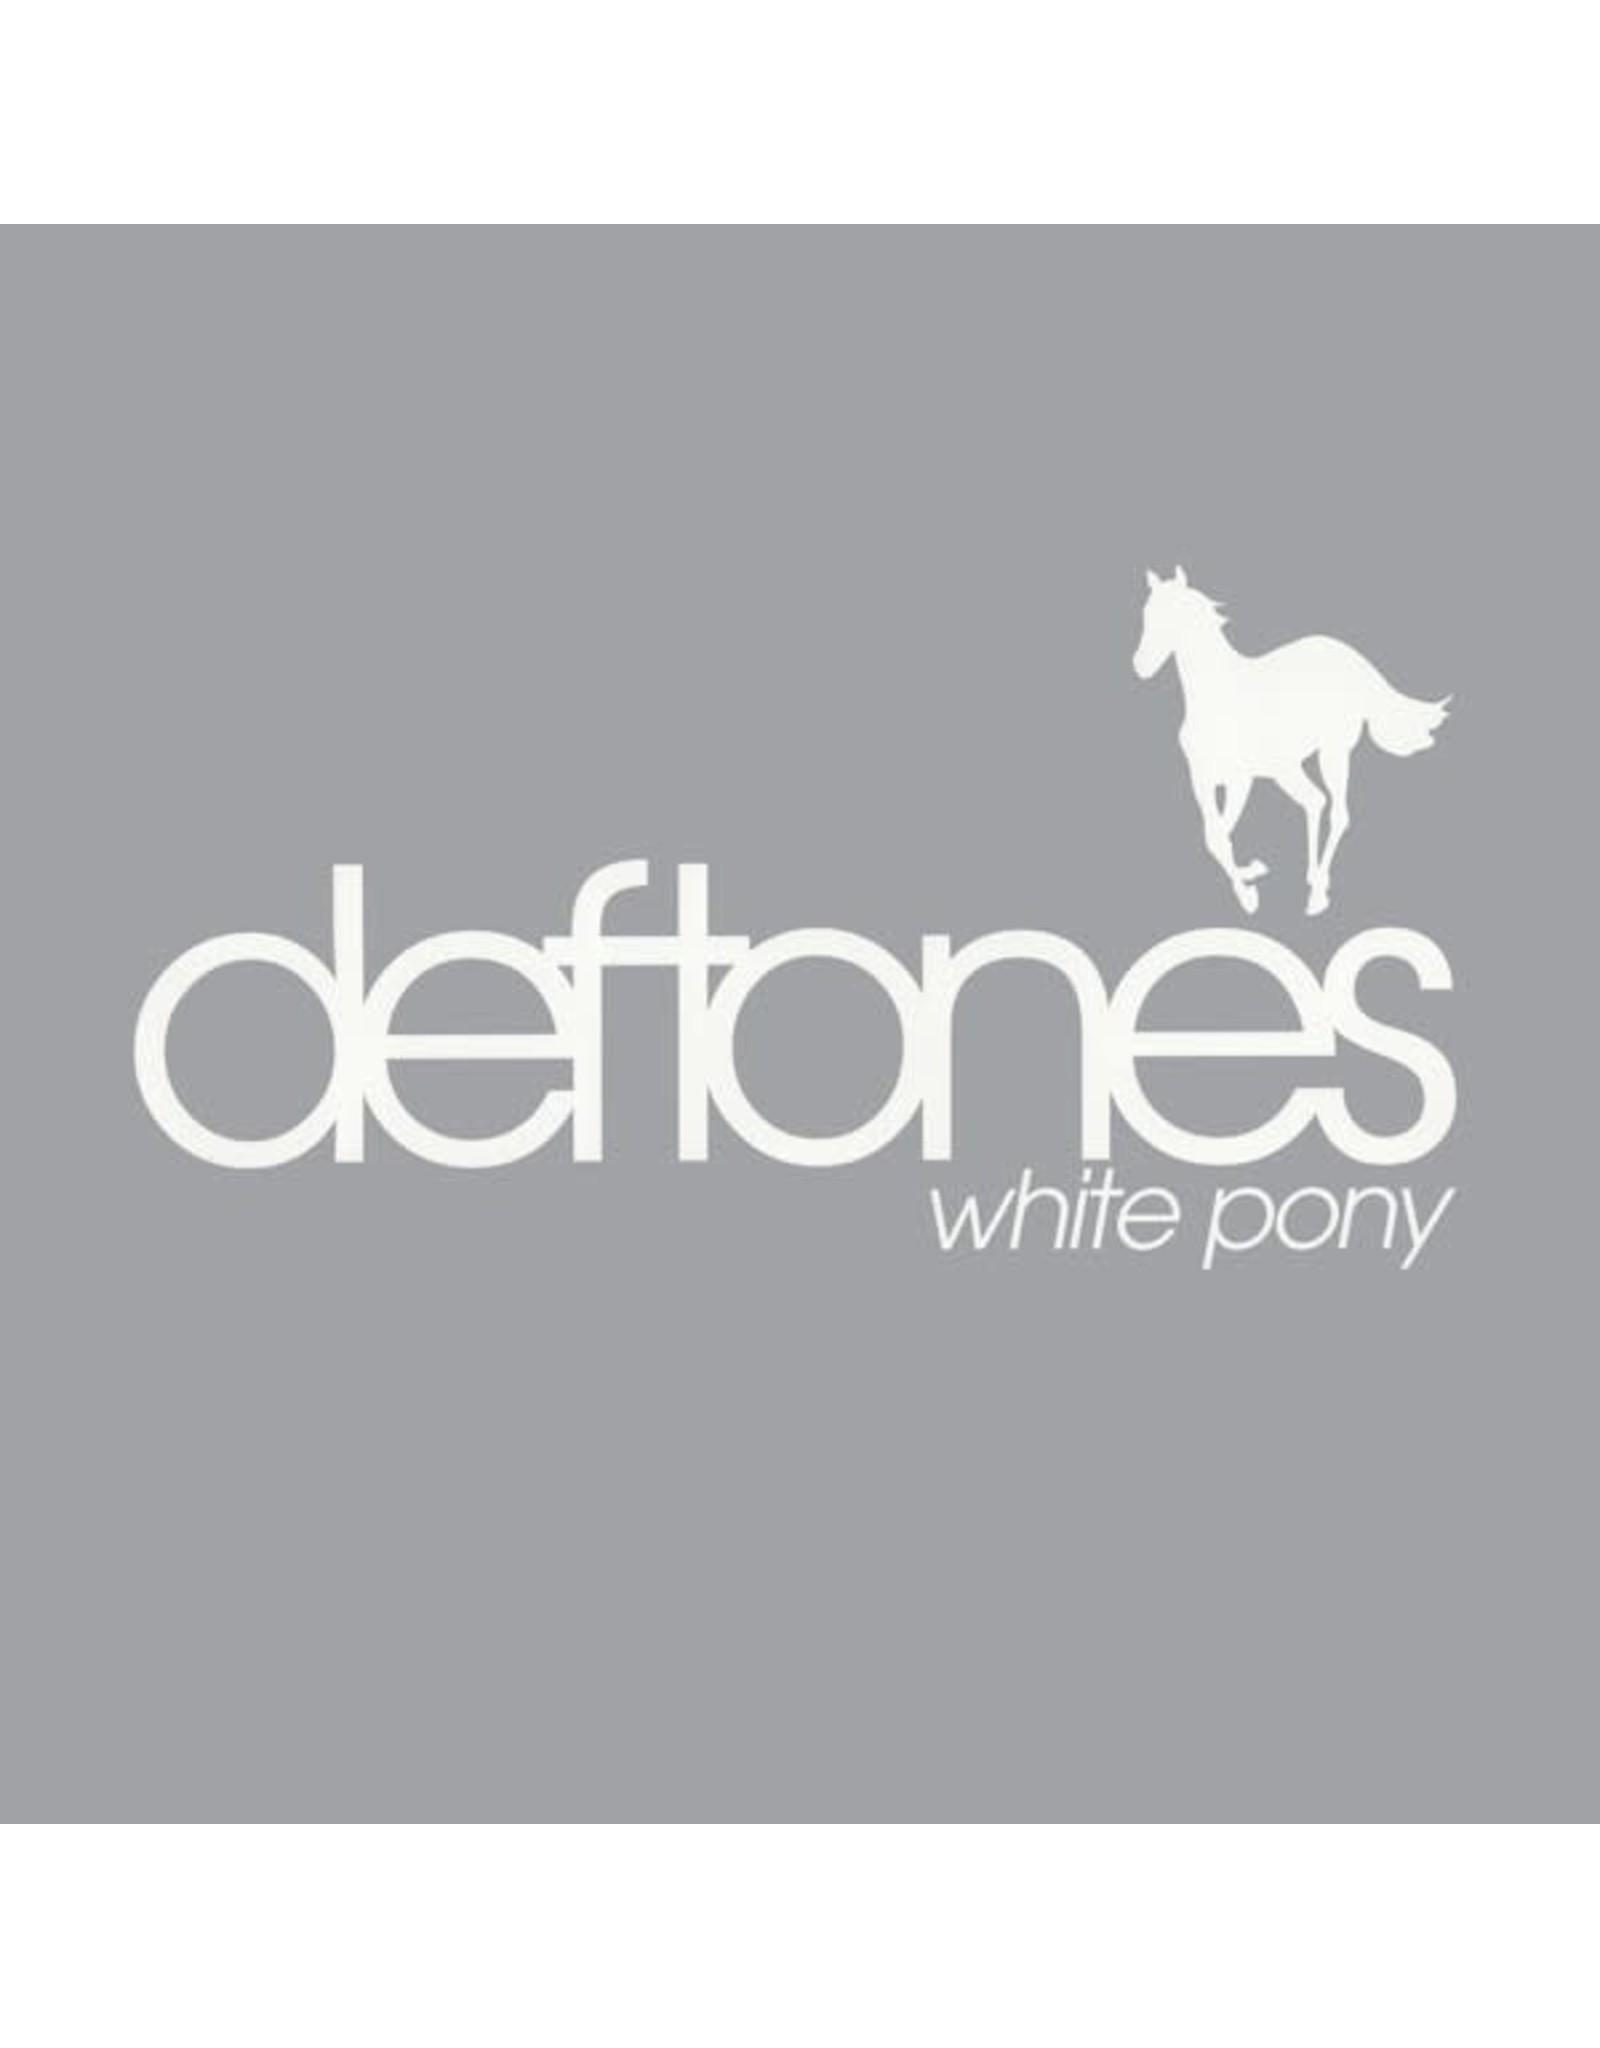 Deftones - White Pony (Reissue) 2LP